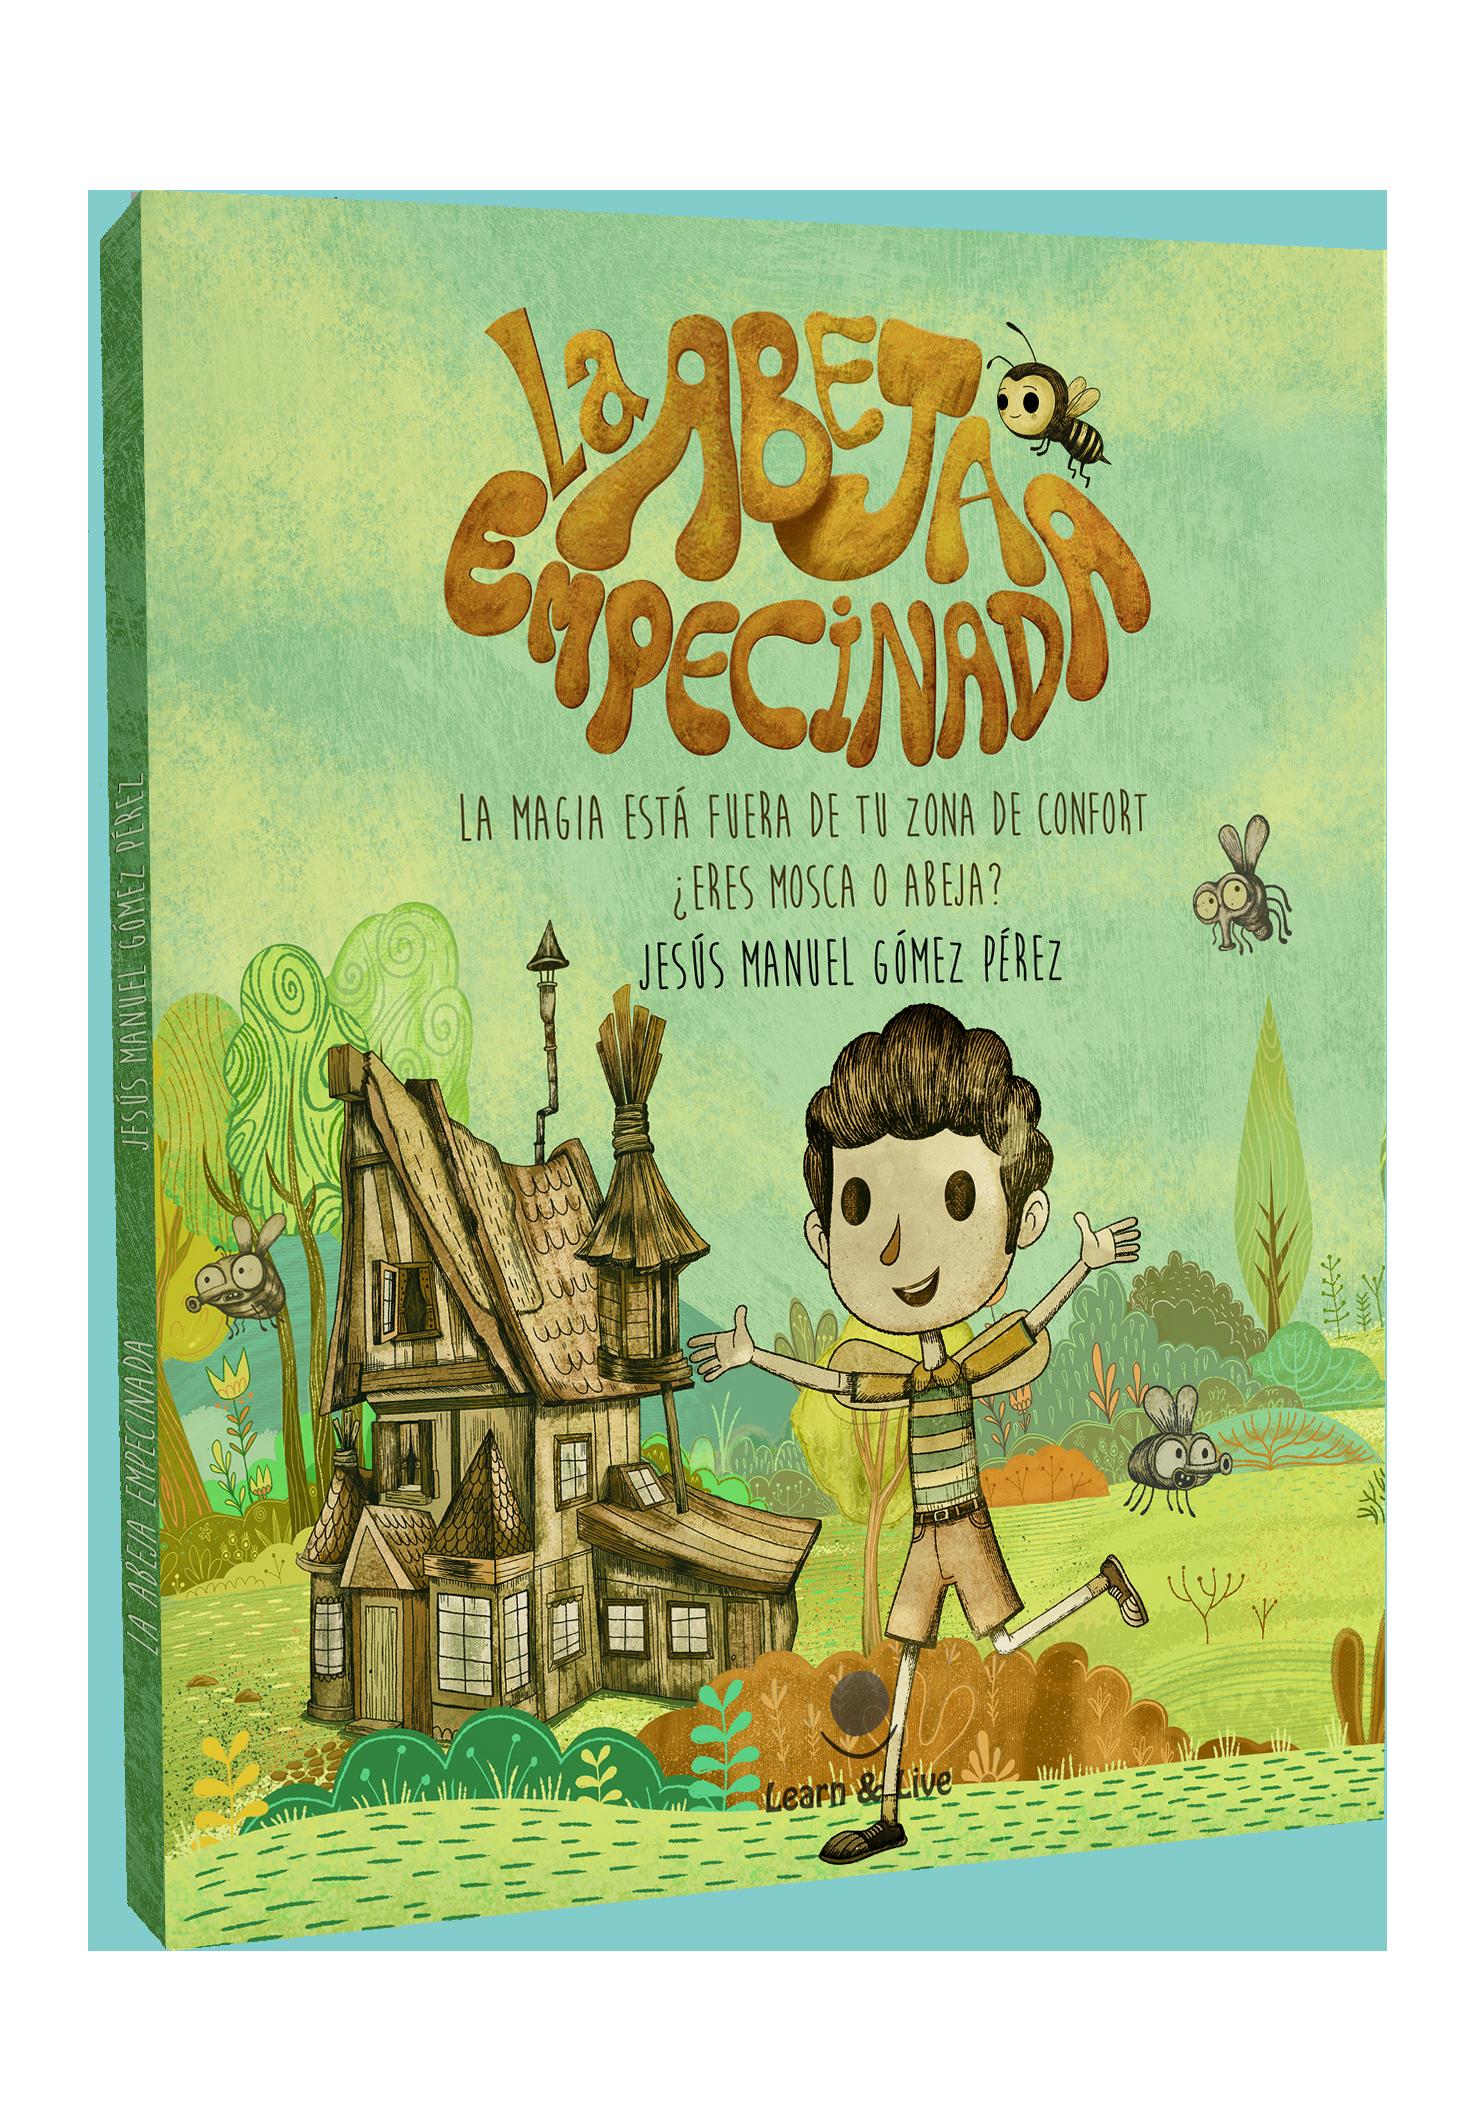 Libro Ilustrado La abeja empecinada_Jesus Manuel Gomez Perez